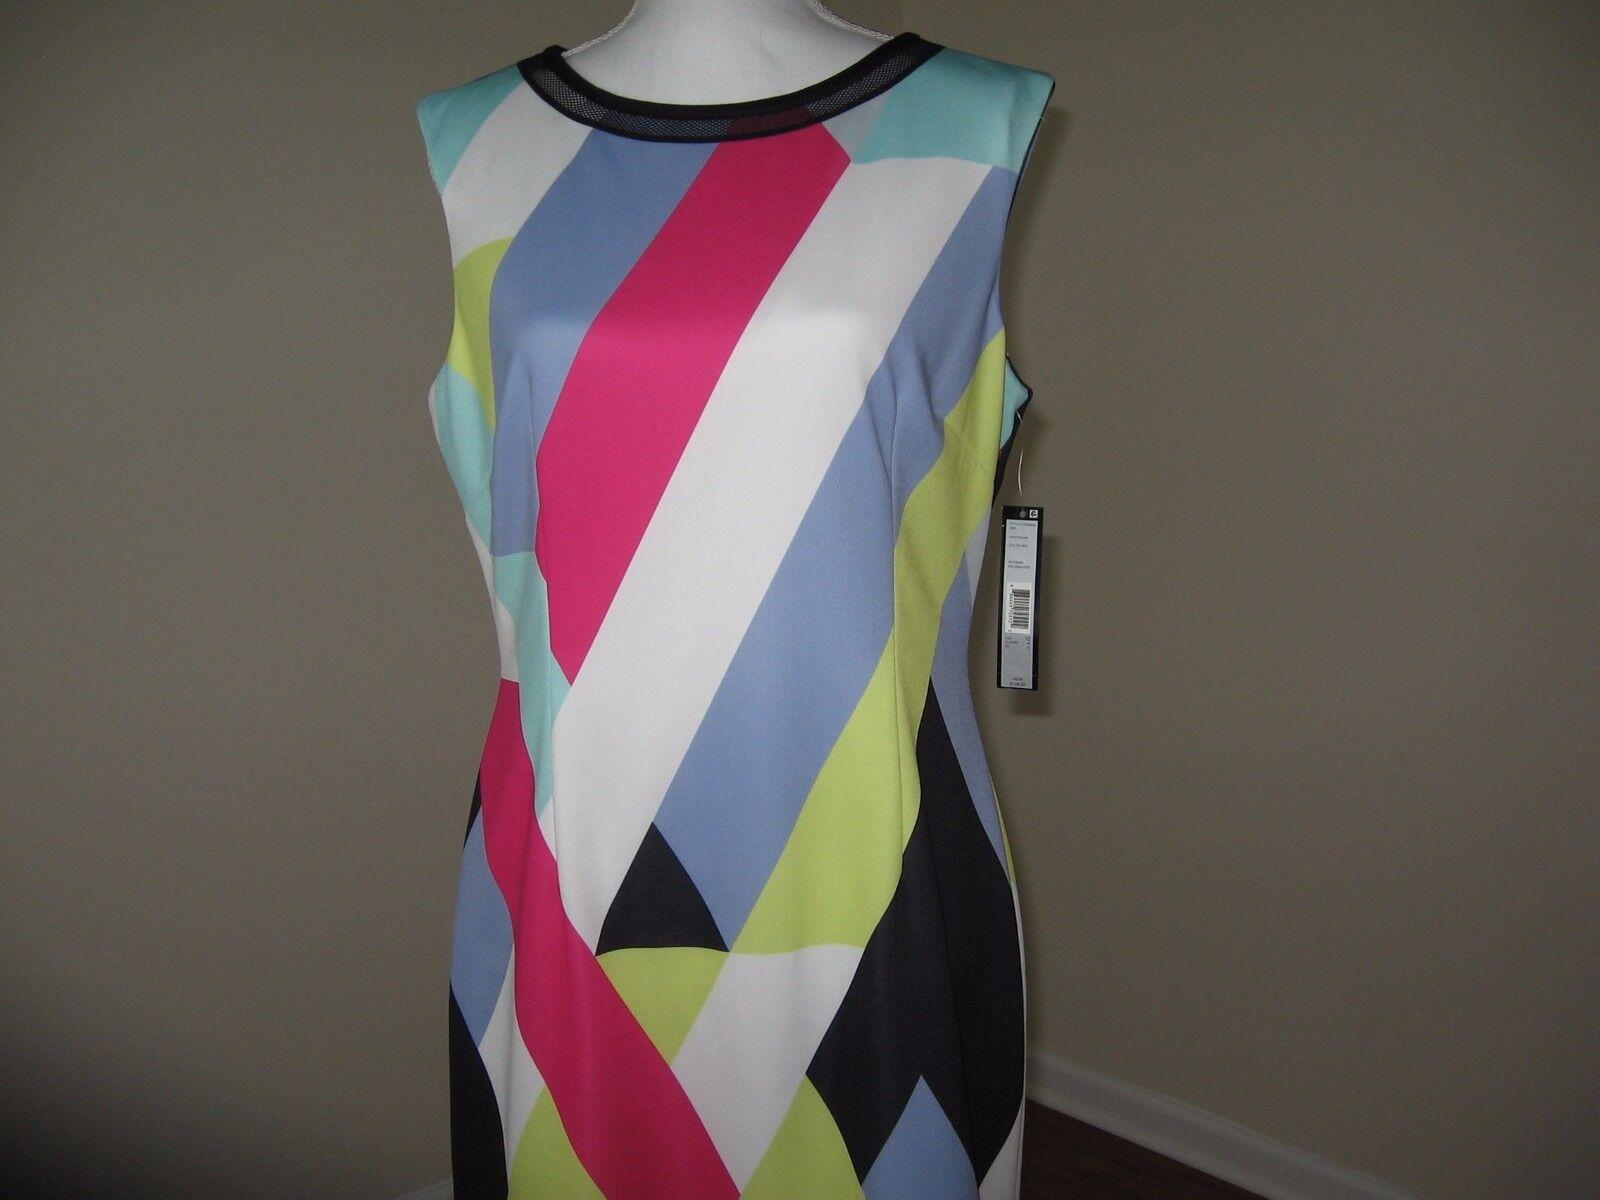 Tahari ASL Geometric Striped Scuba Sheath Dress for Woman Size 10 12 NWT